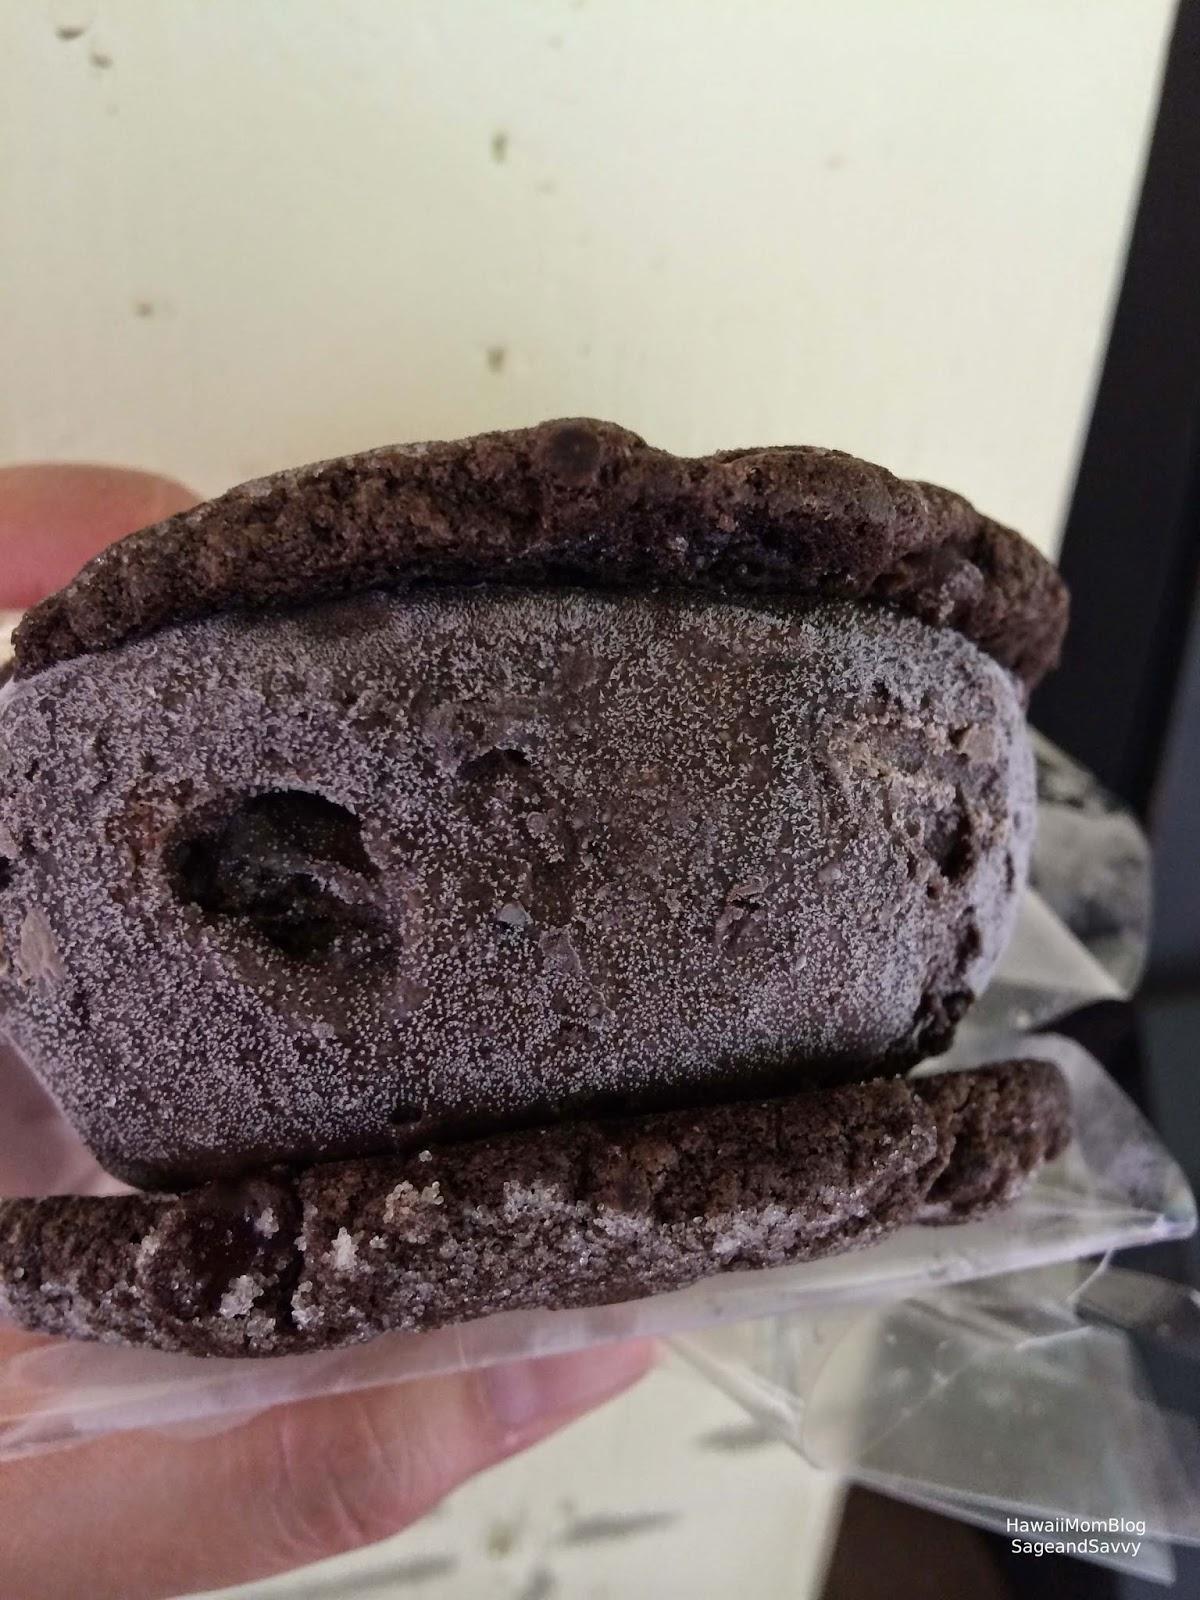 Hawaii mom blog visit oahu waimea valley for Gourmet ice cream sandwich